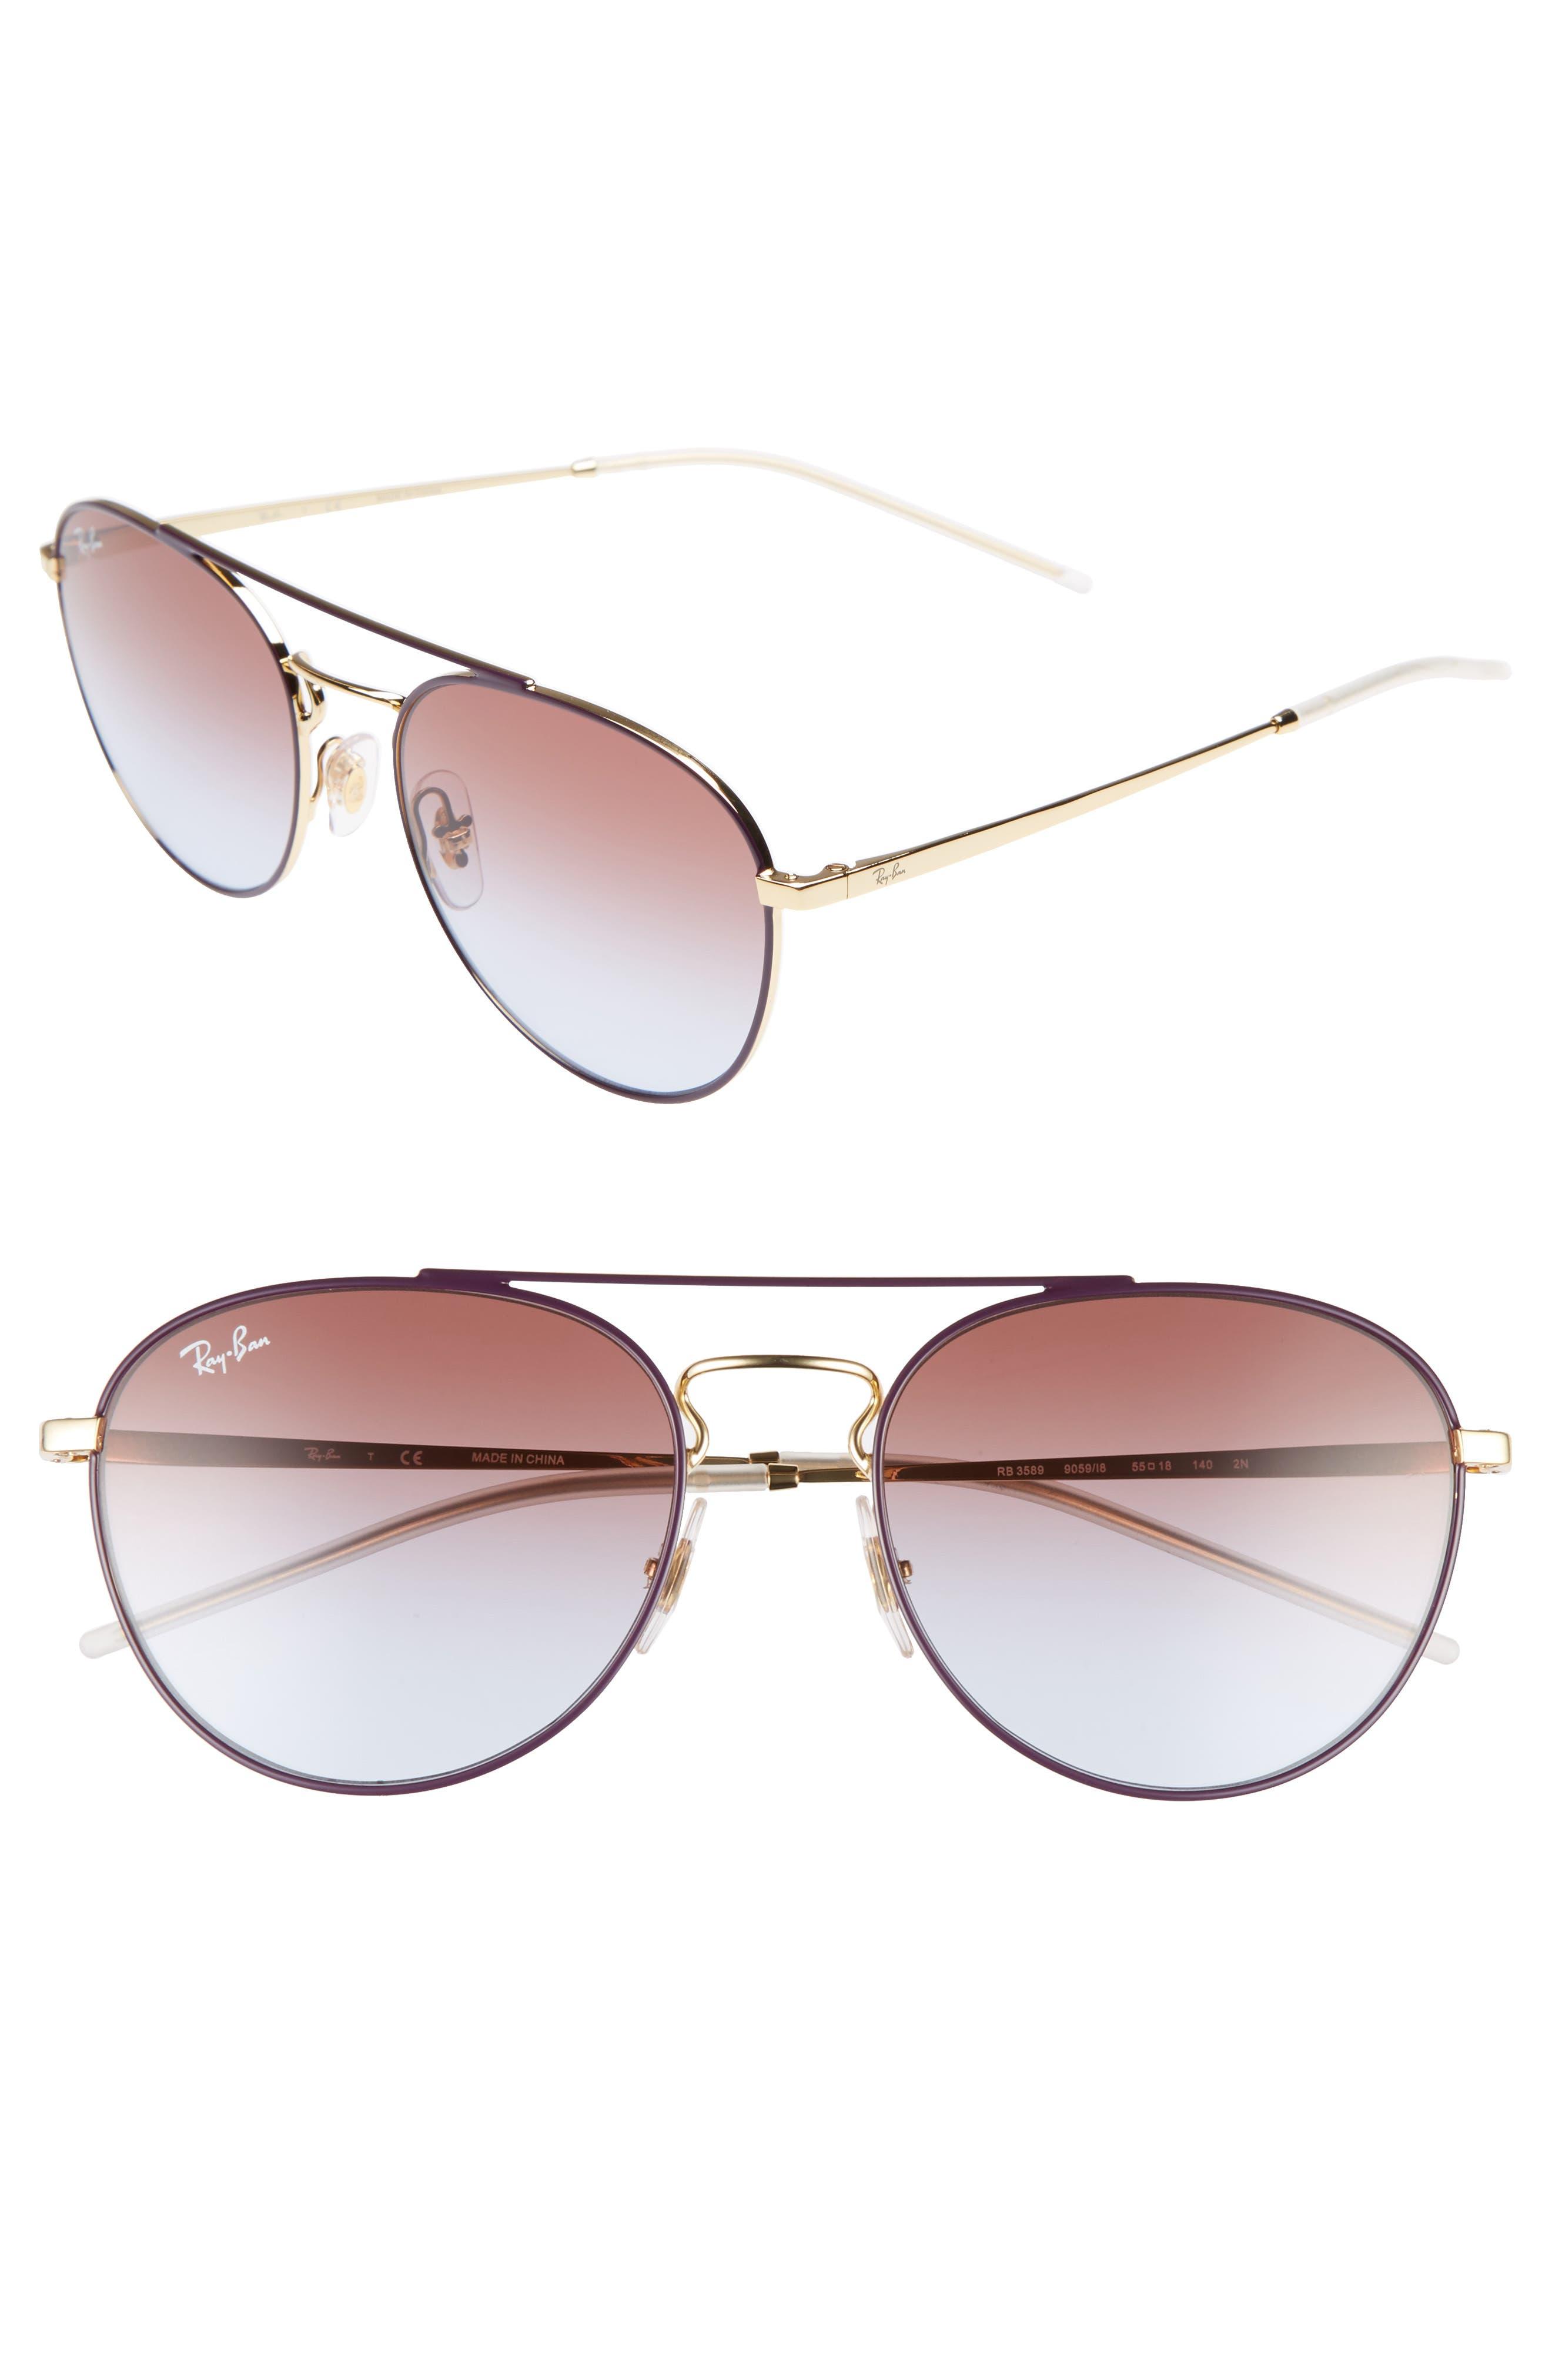 55mm Gradient Lens Round Aviator Sunglasses,                             Main thumbnail 3, color,